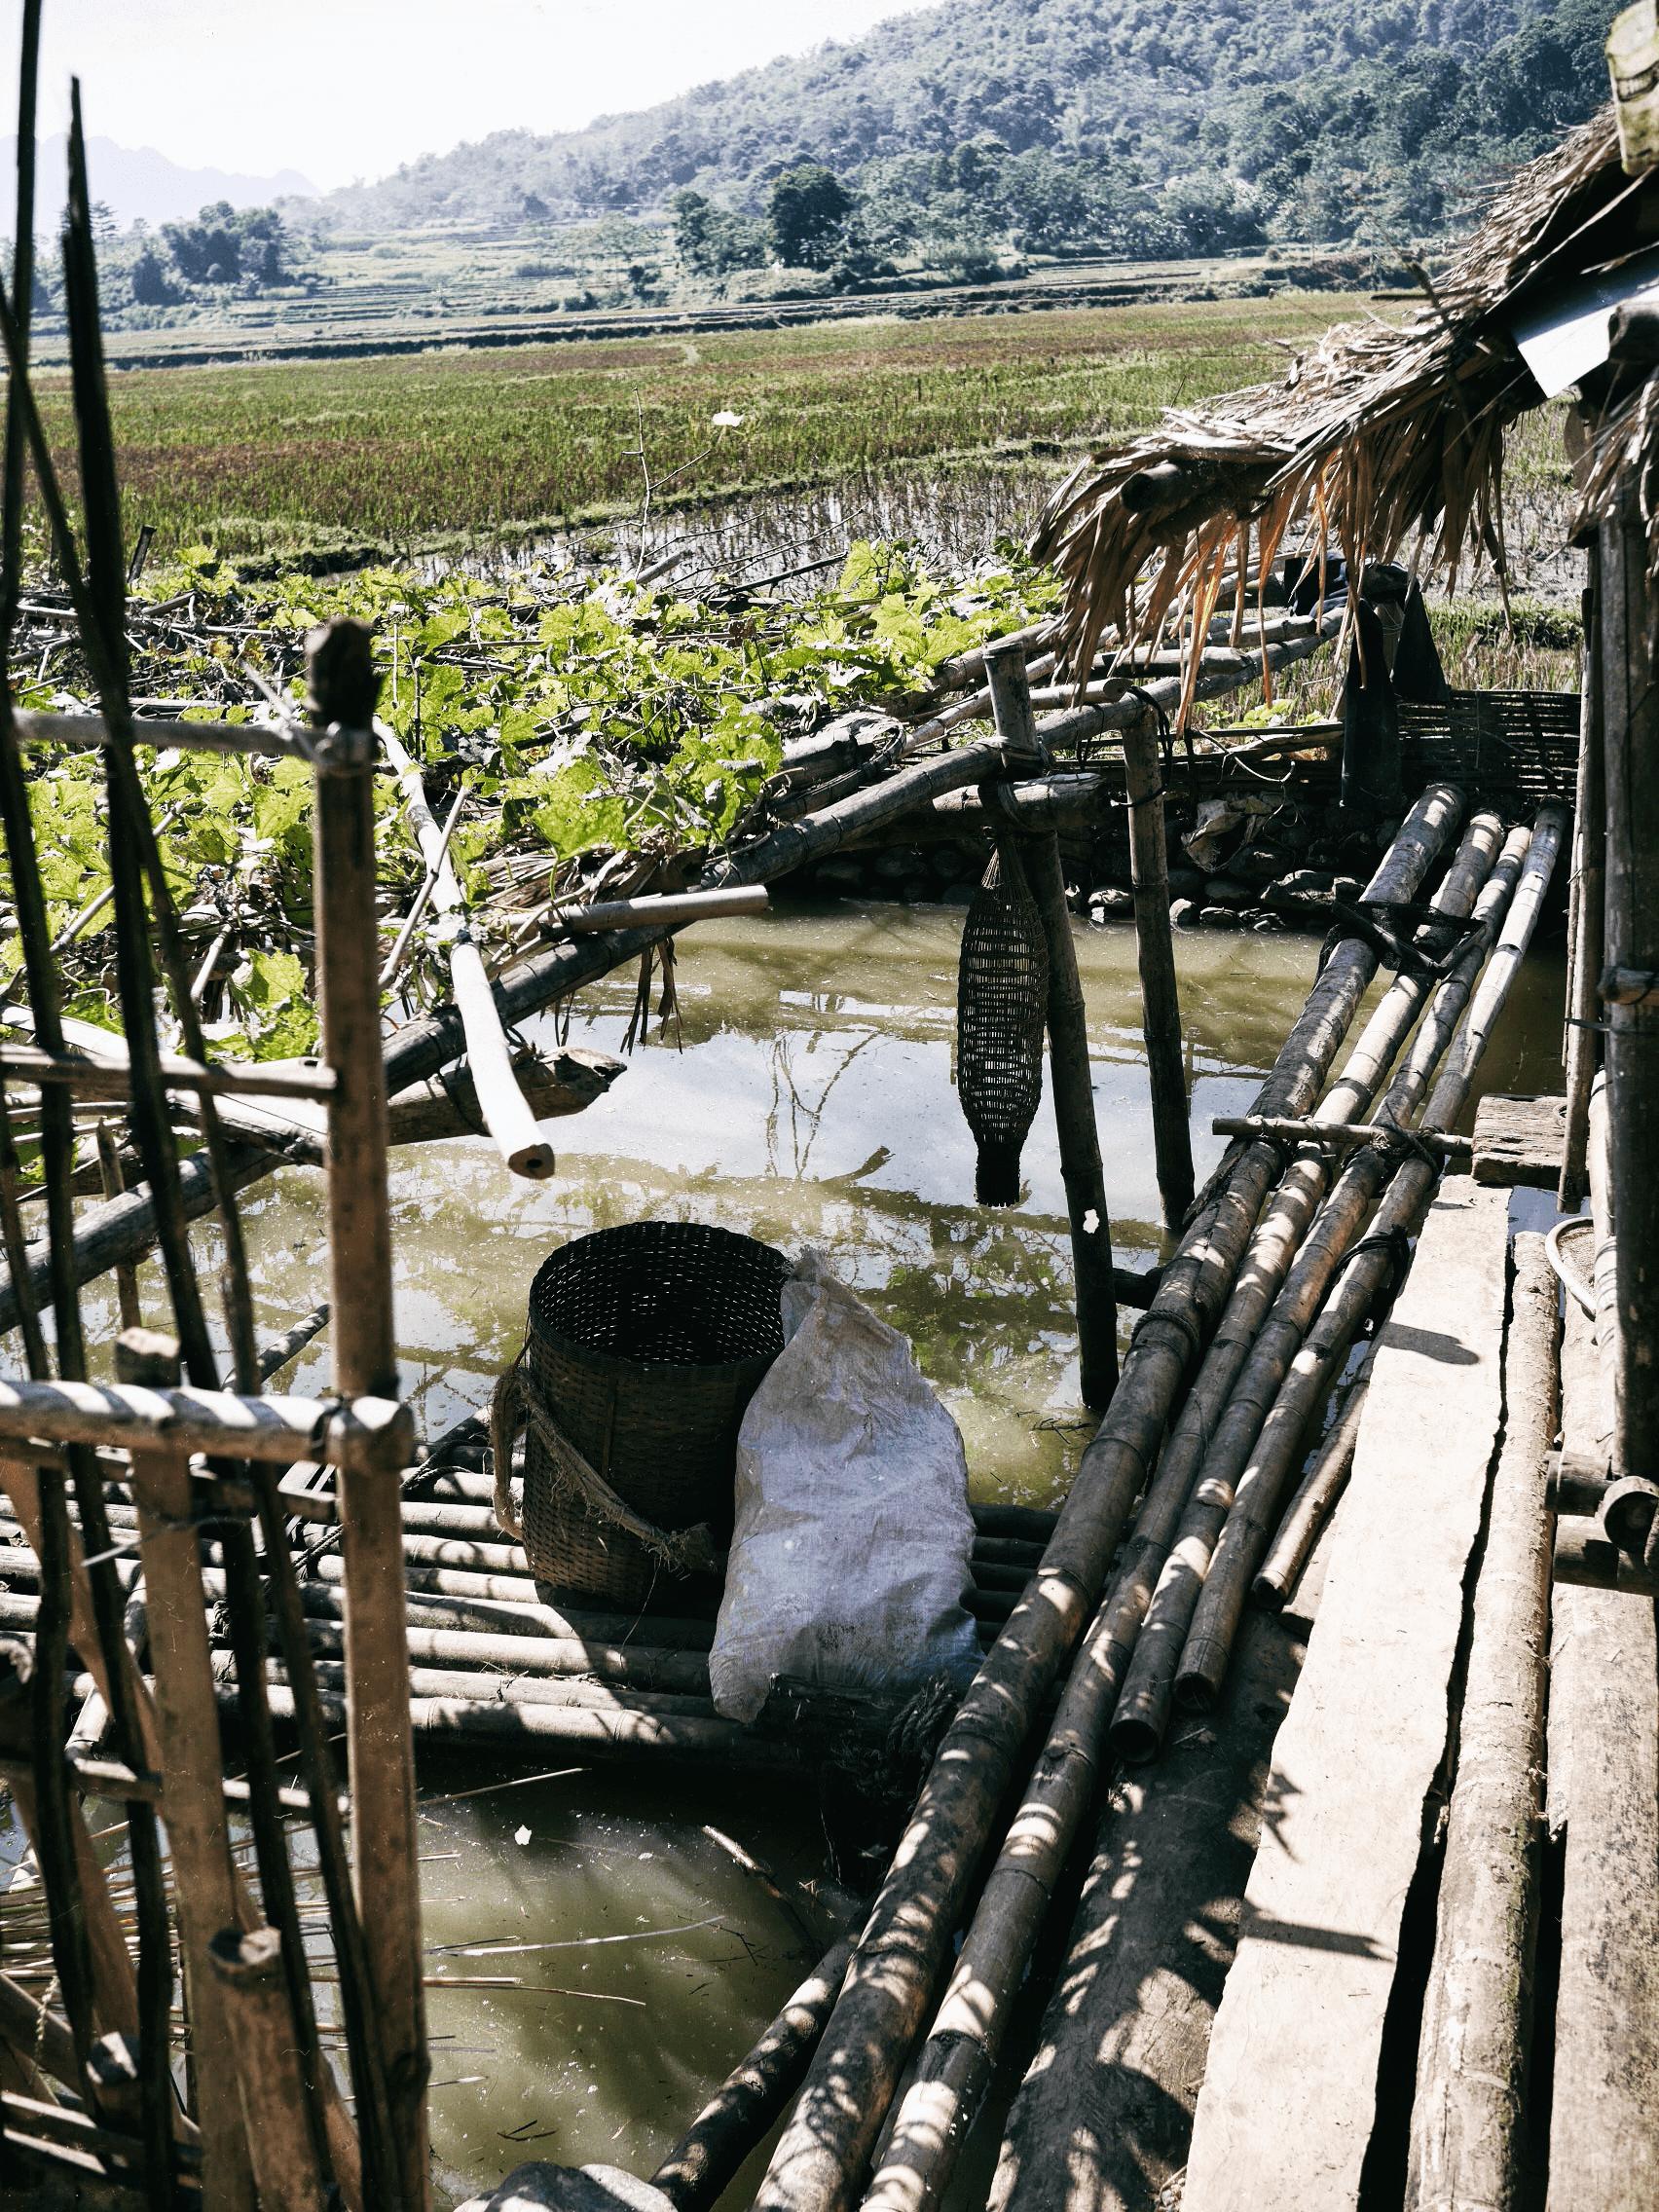 Pu Luong reserve village